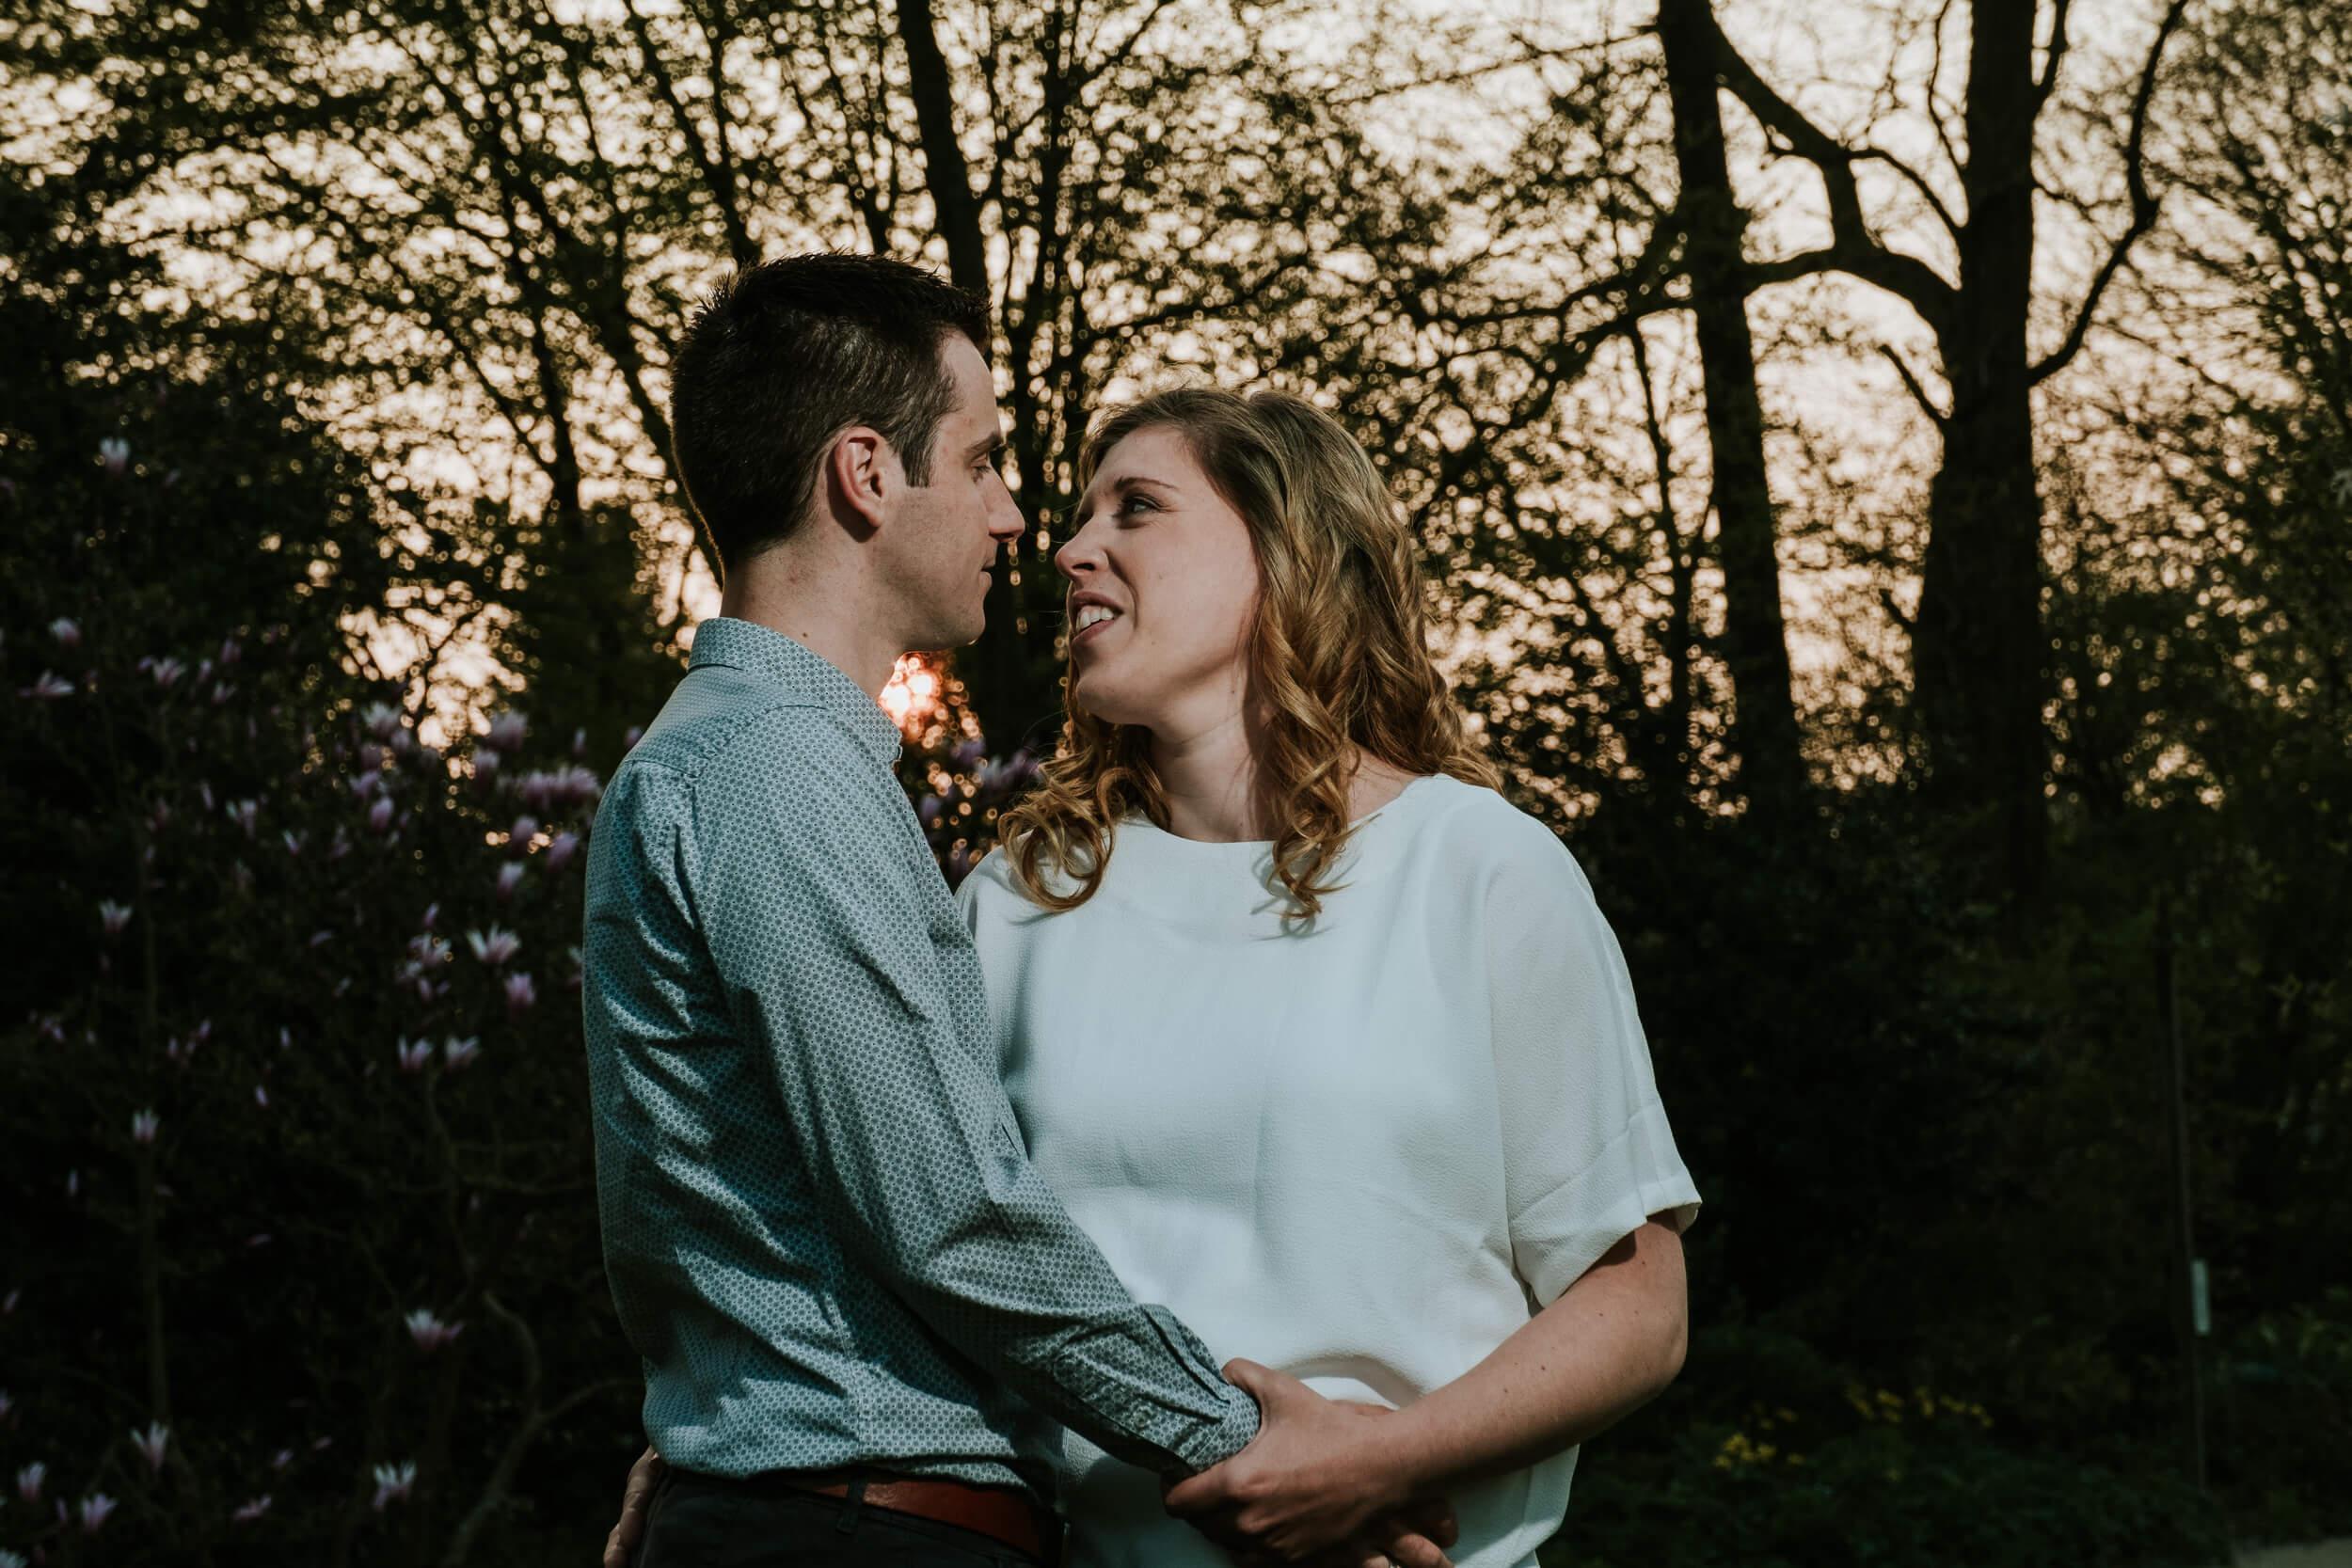 Verloving-Engagement-Vlooybergtoren-Hoegaarden-Tielt-Alternatief-22.JPG